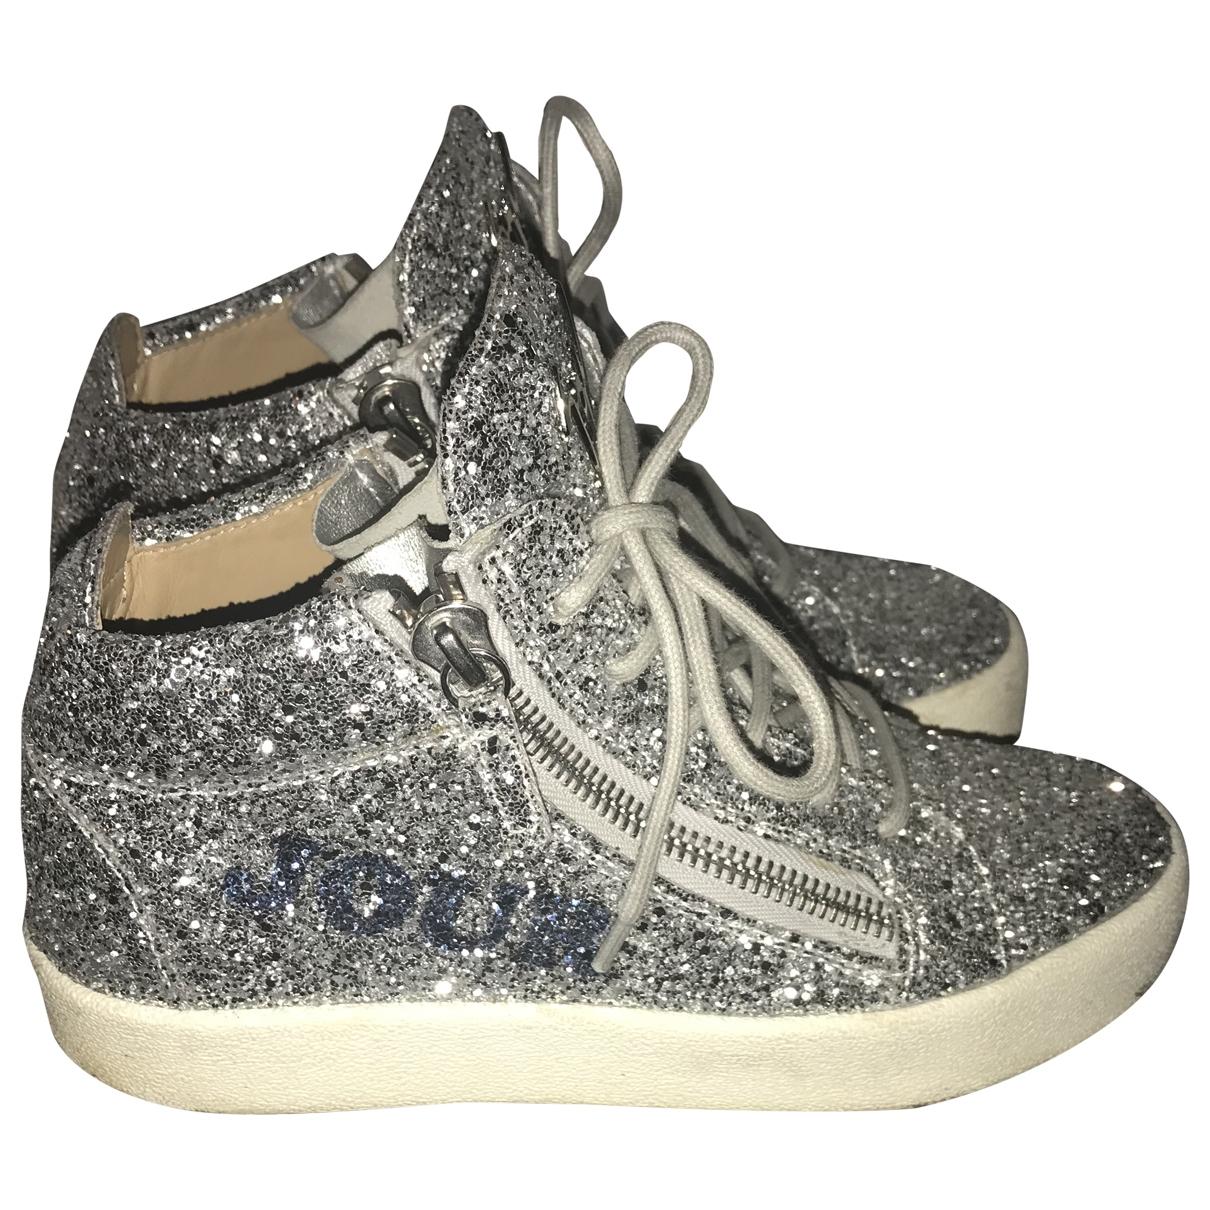 Giuseppe Zanotti Donna Sneakers in  Silber Mit Pailletten